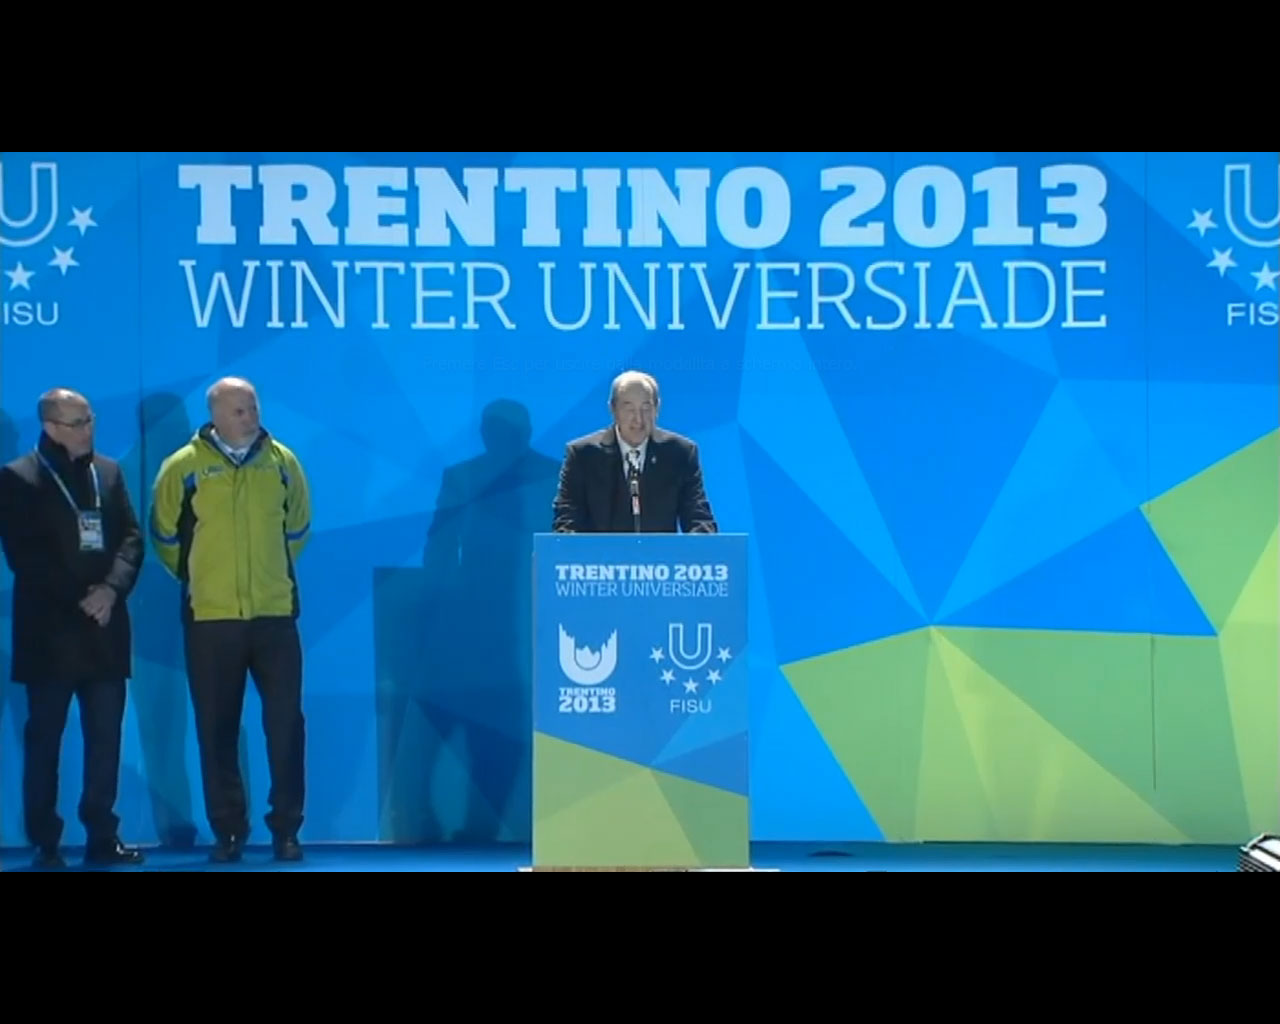 universiade trento video2mp3 - photo#8